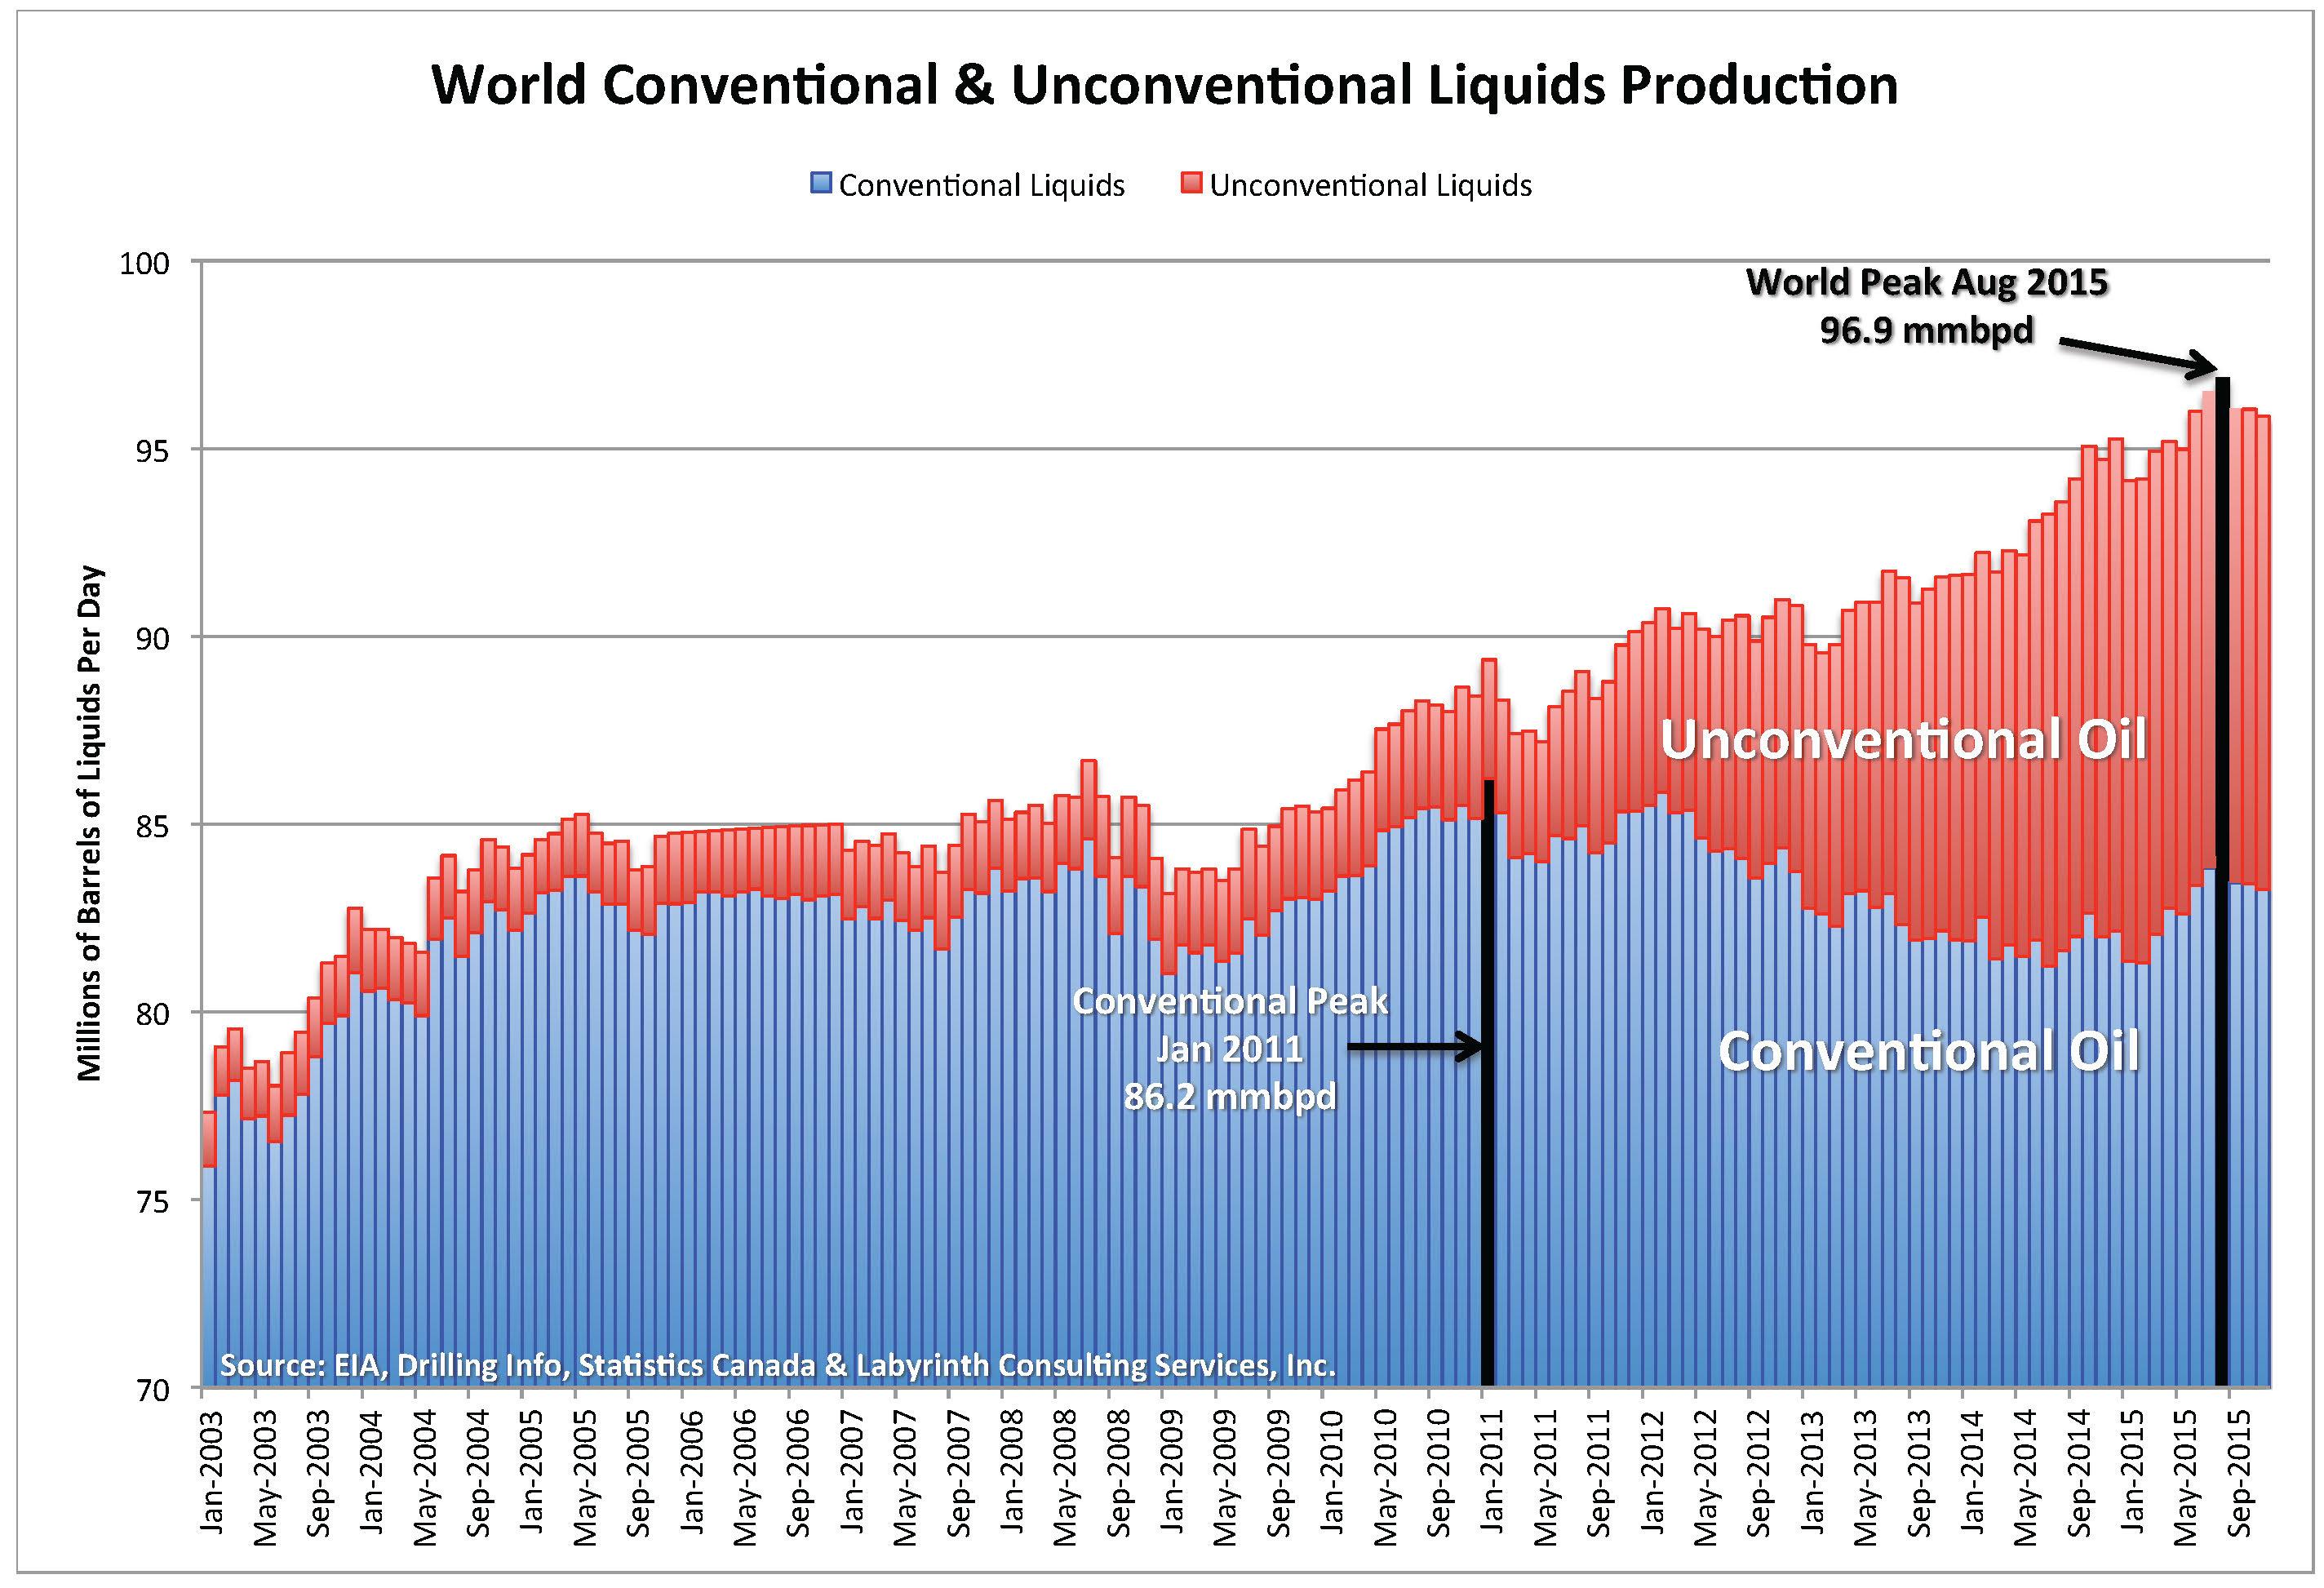 http://www.artberman.com/wp-content/uploads/Chart_World-Con-Uncon-1.jpg